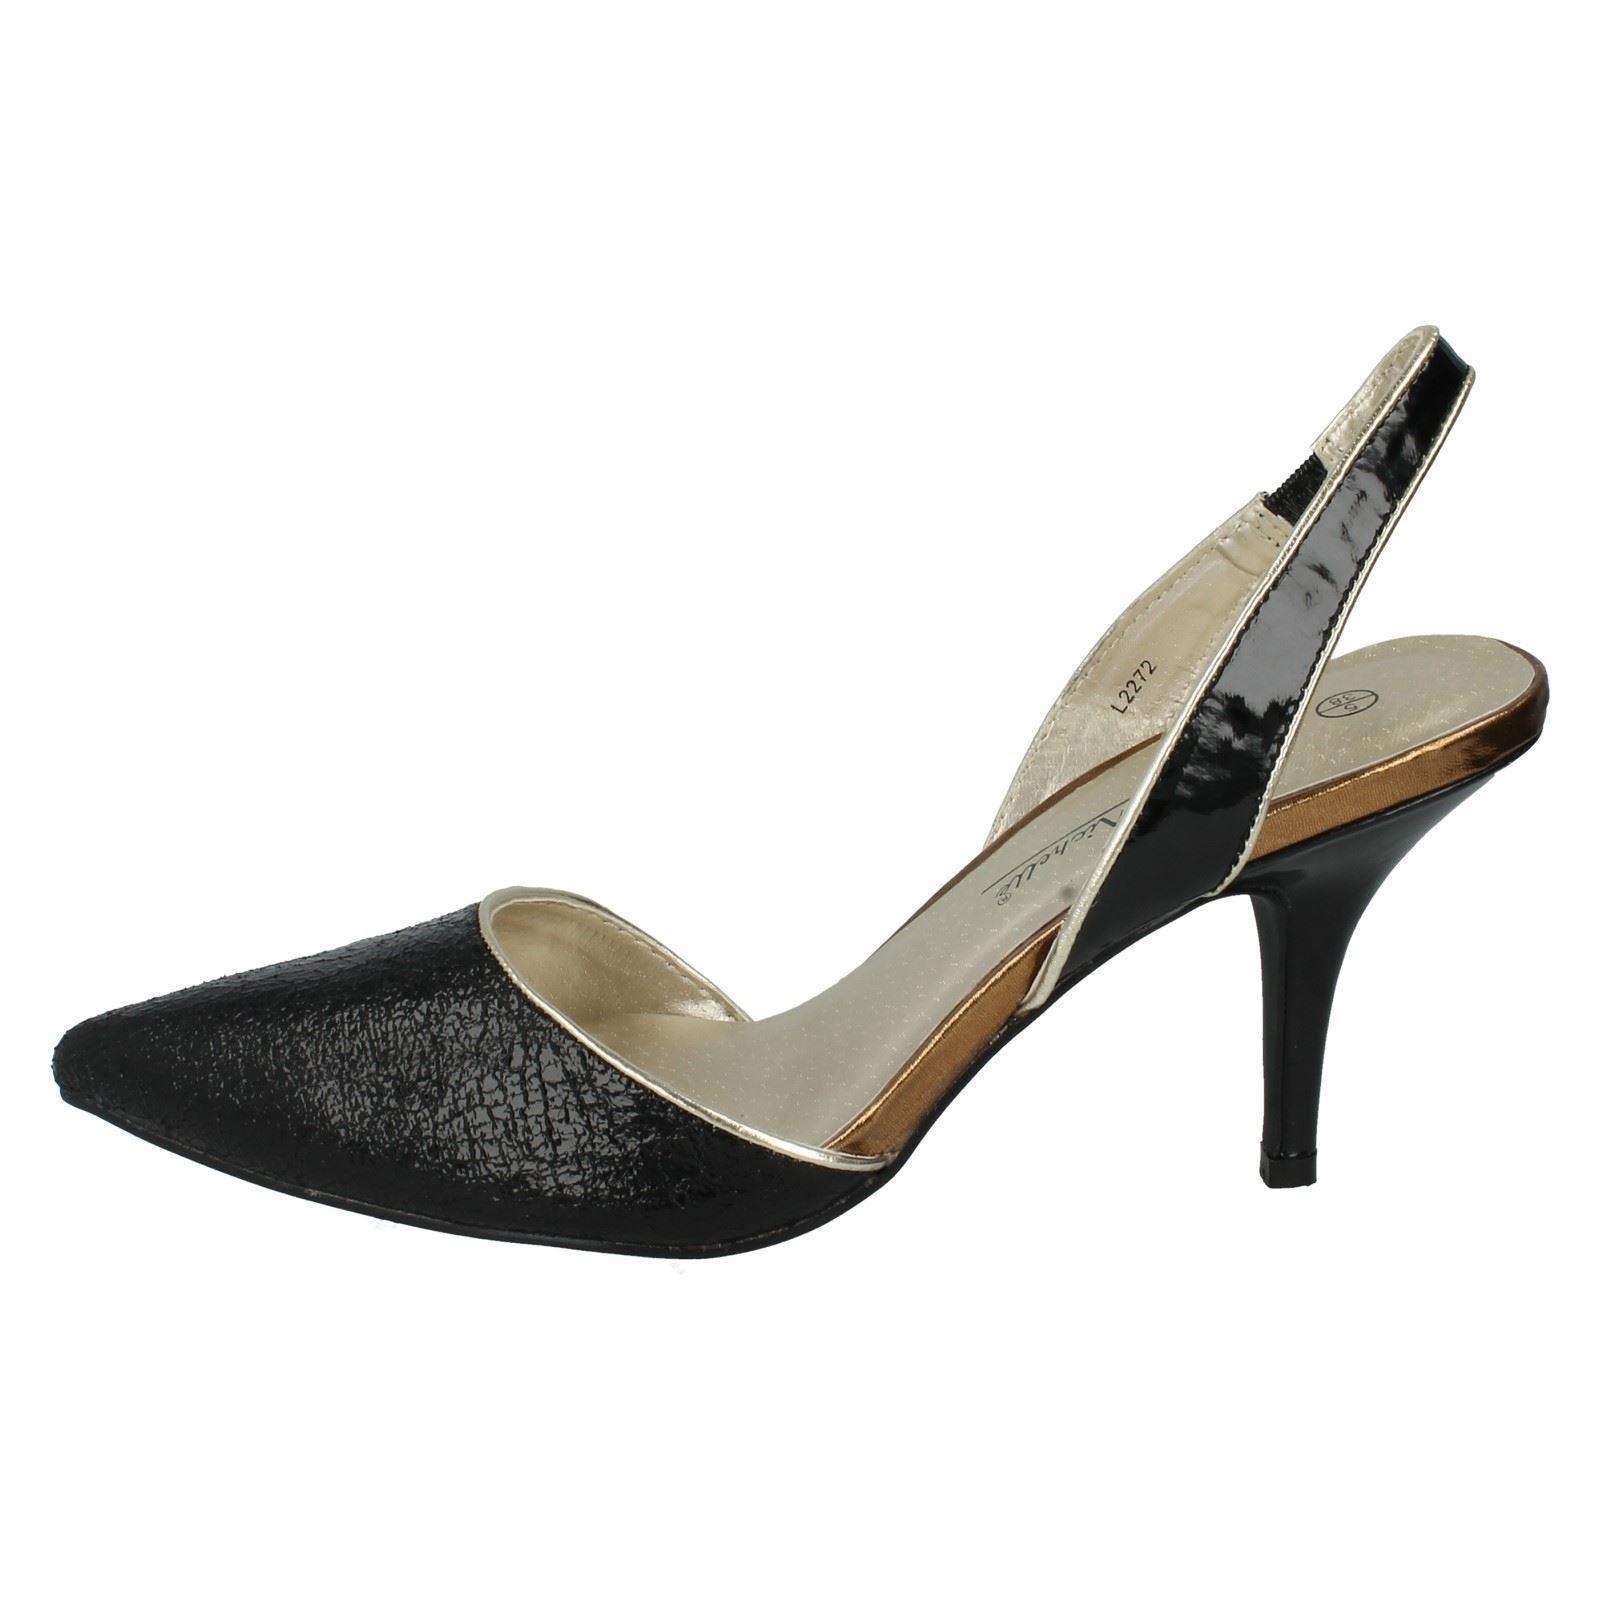 Señoras Anne Michelle Zapatos Tenis l2272